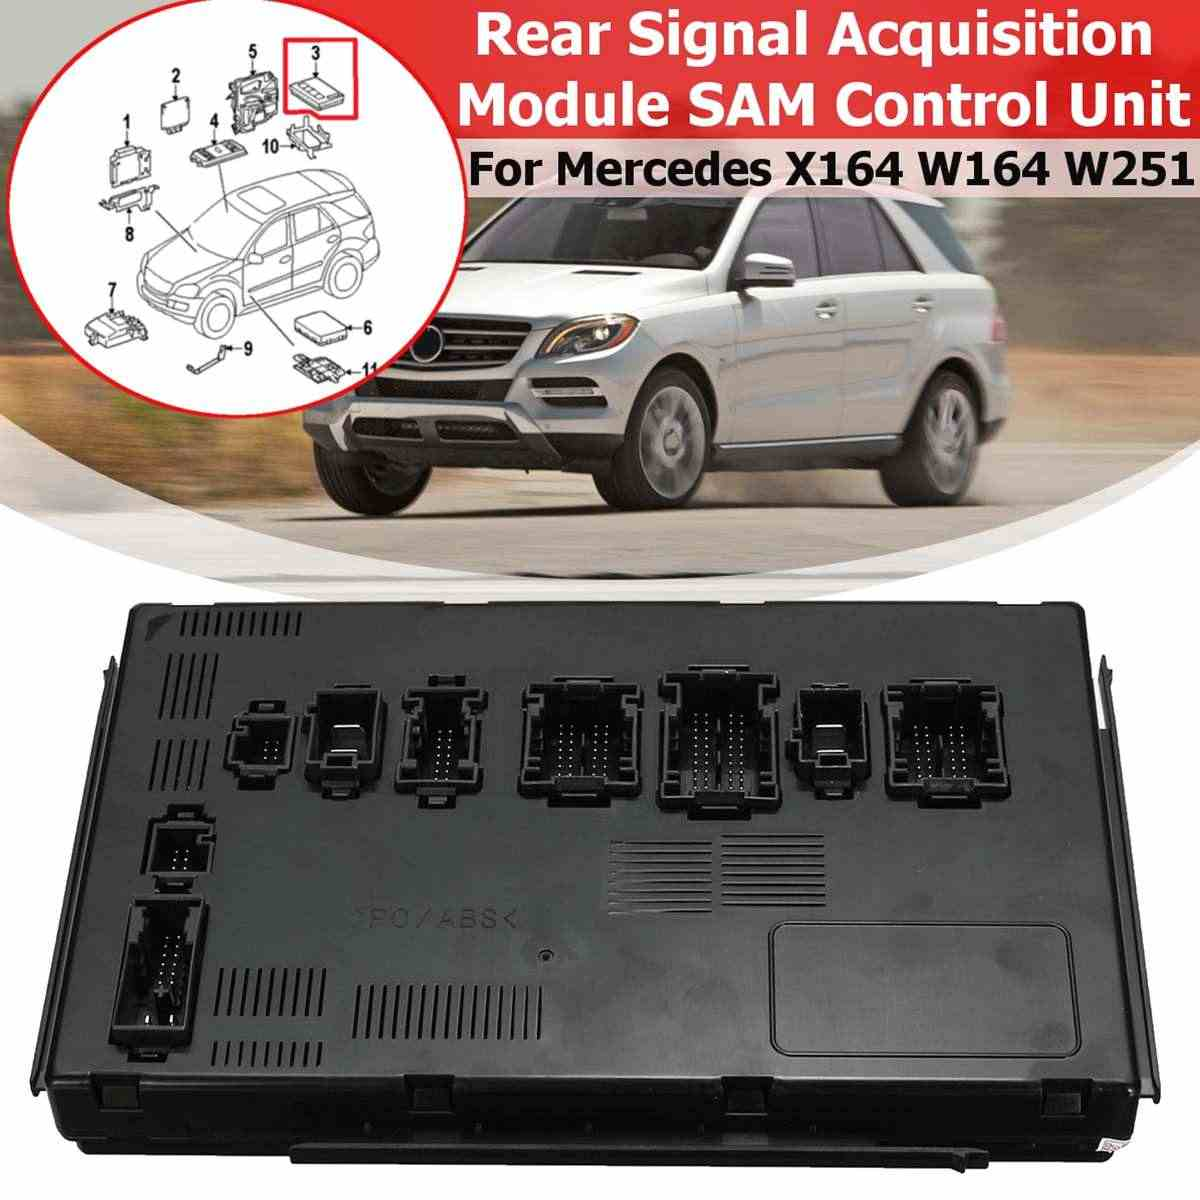 hight resolution of 1pcs for mercedes benz x164 w164 w251 gl320 gl350 rear signal acquisition module sam control